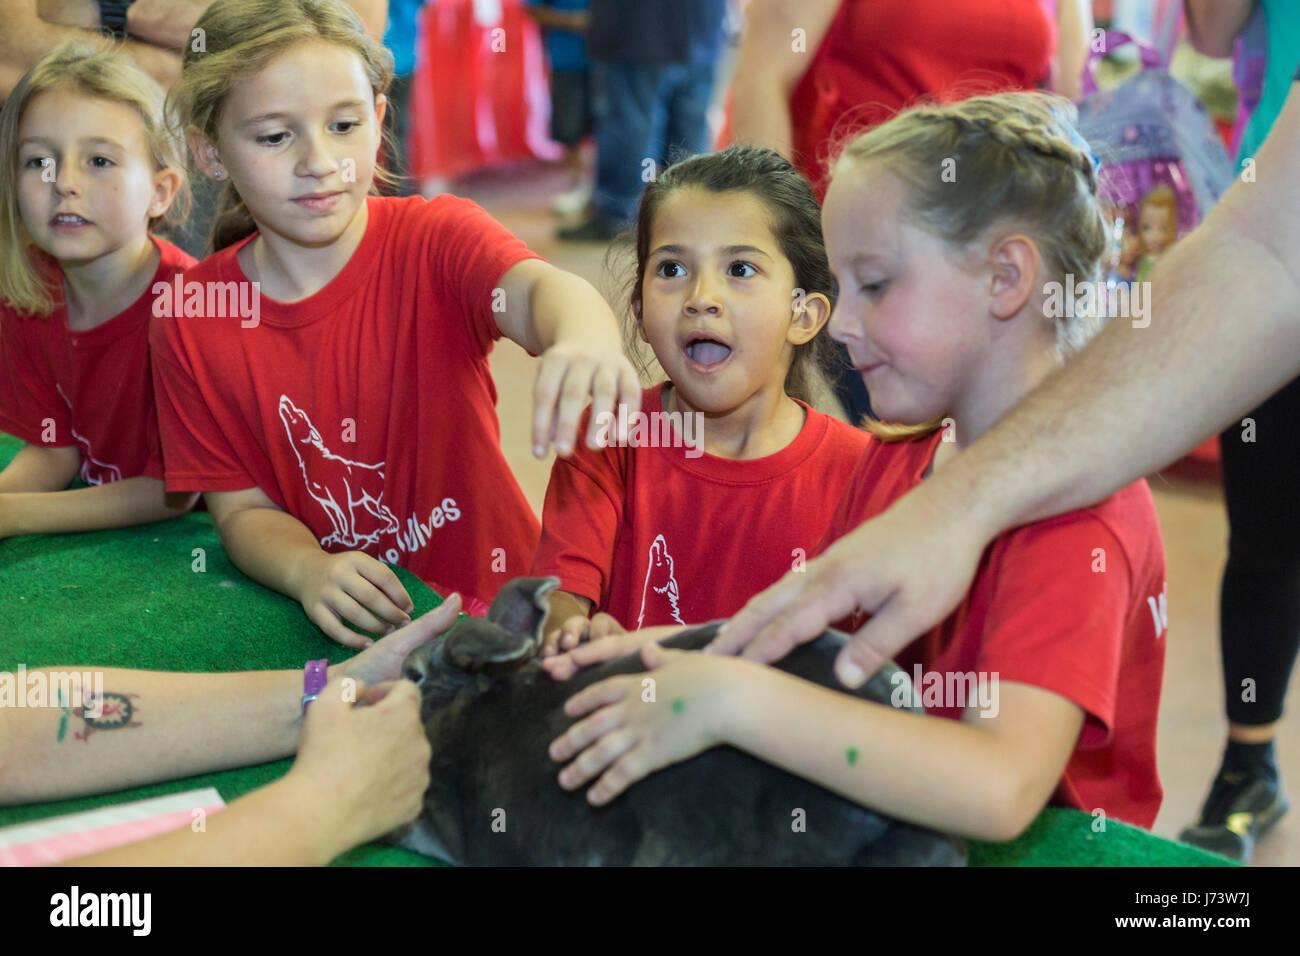 Phoenix, Arizona - Children pet Rex, a therapy rabbit, at the Maricopa County Fair. - Stock Image